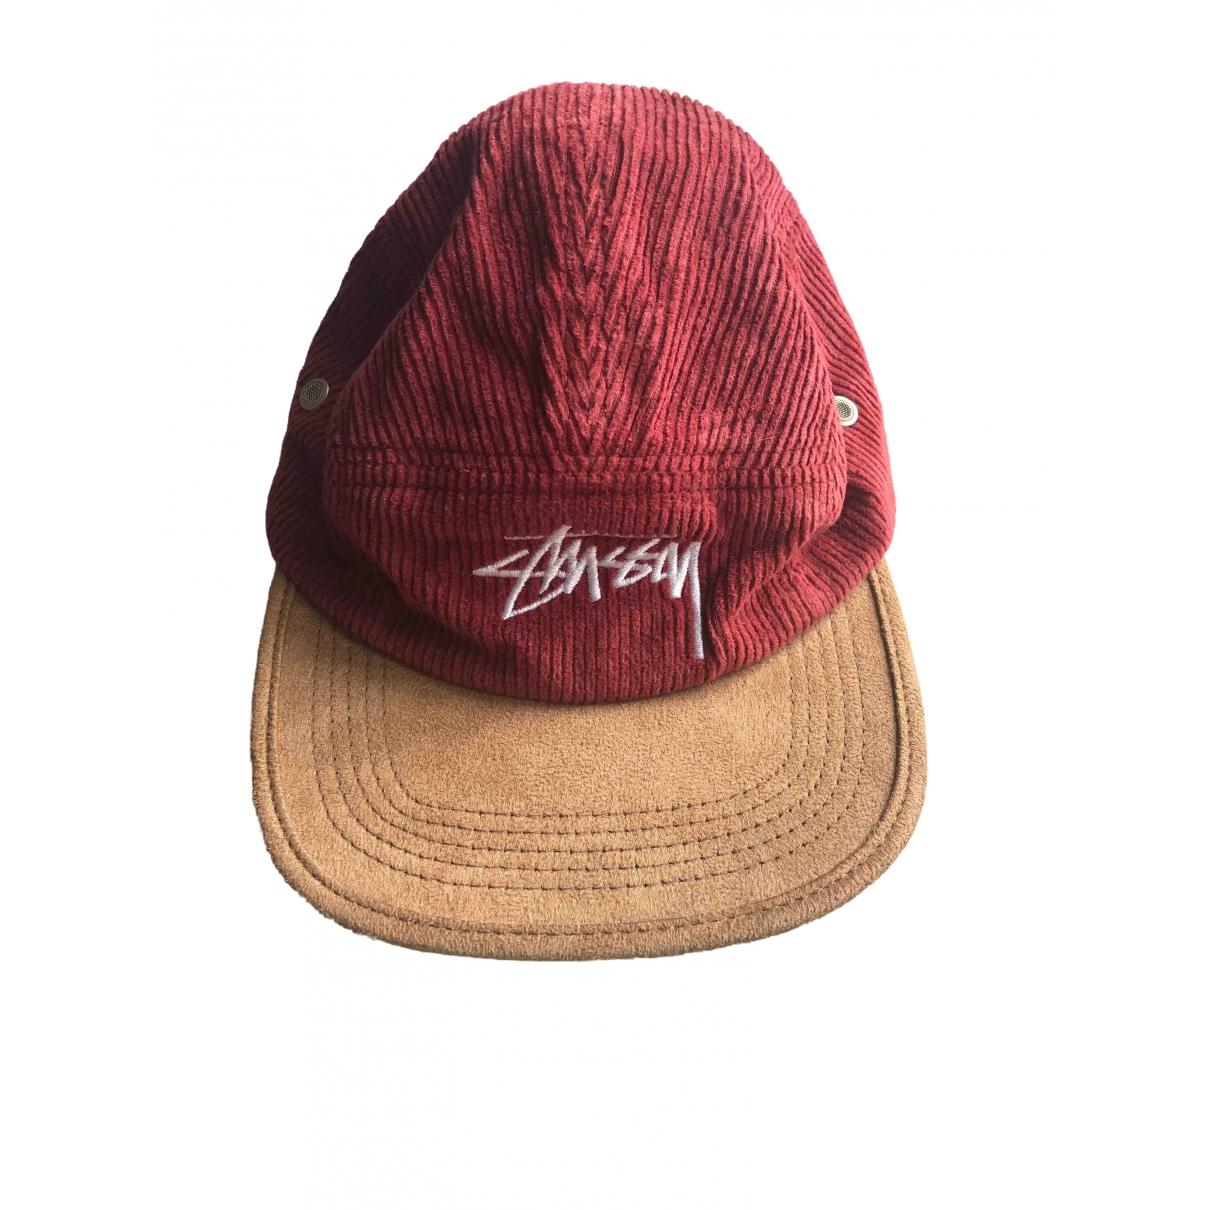 Sombrero / gorro de Lona Stussy